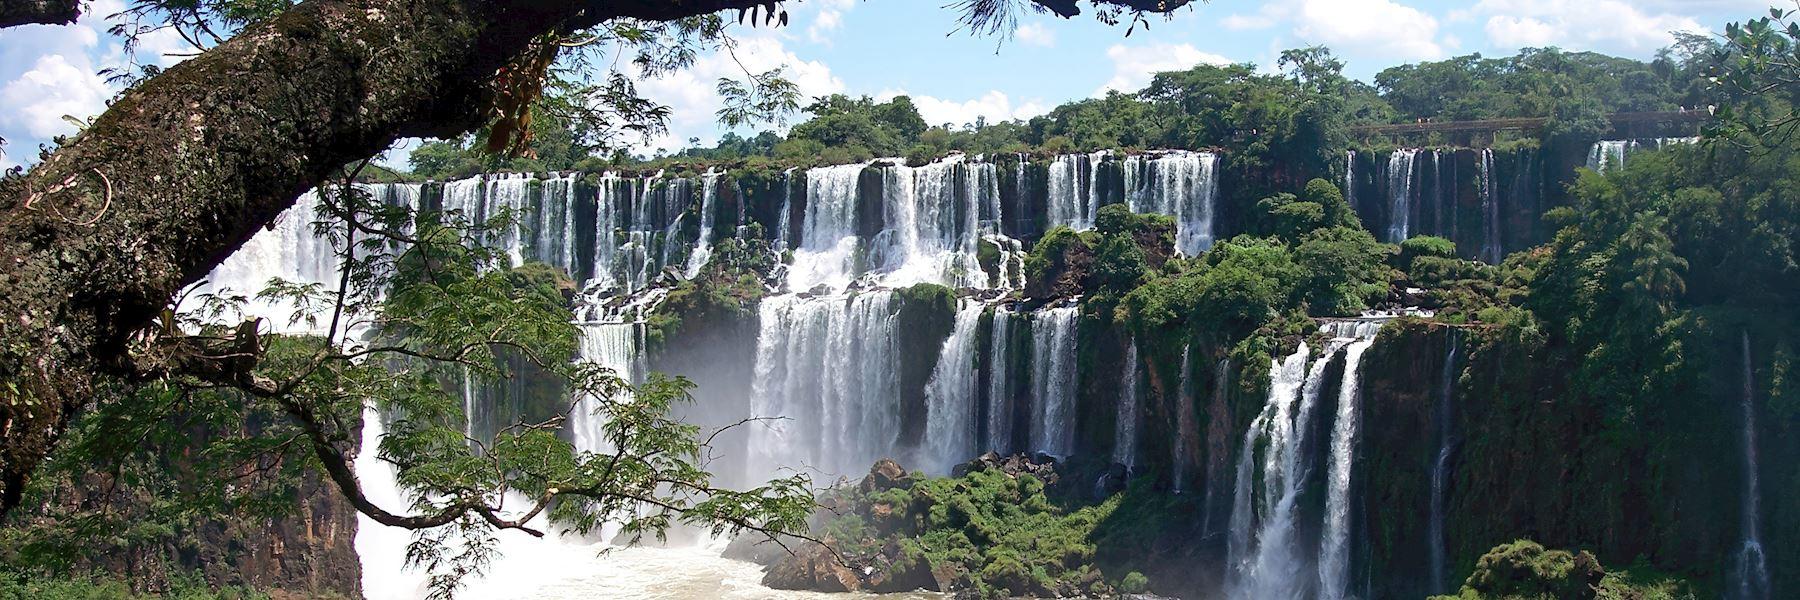 Visit Iguaçu Falls, Brazil